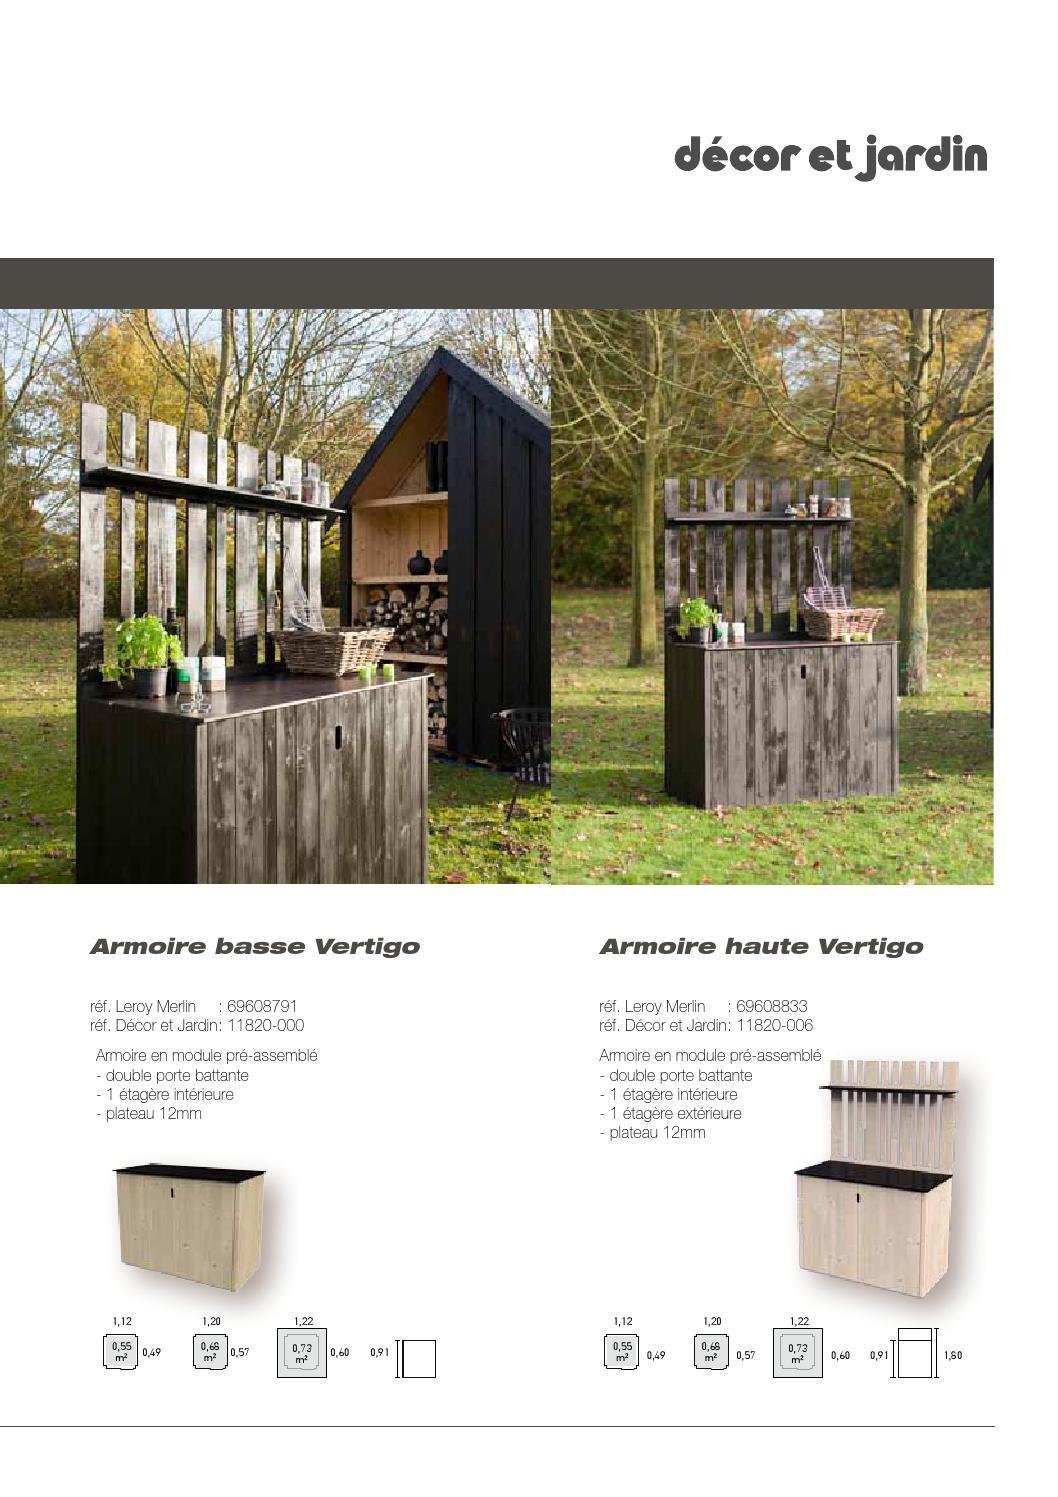 Décor Et Jardin Catalogue Leroy Merlin By Cras Woodgroup - Issuu intérieur Porte De Jardin Leroy Merlin